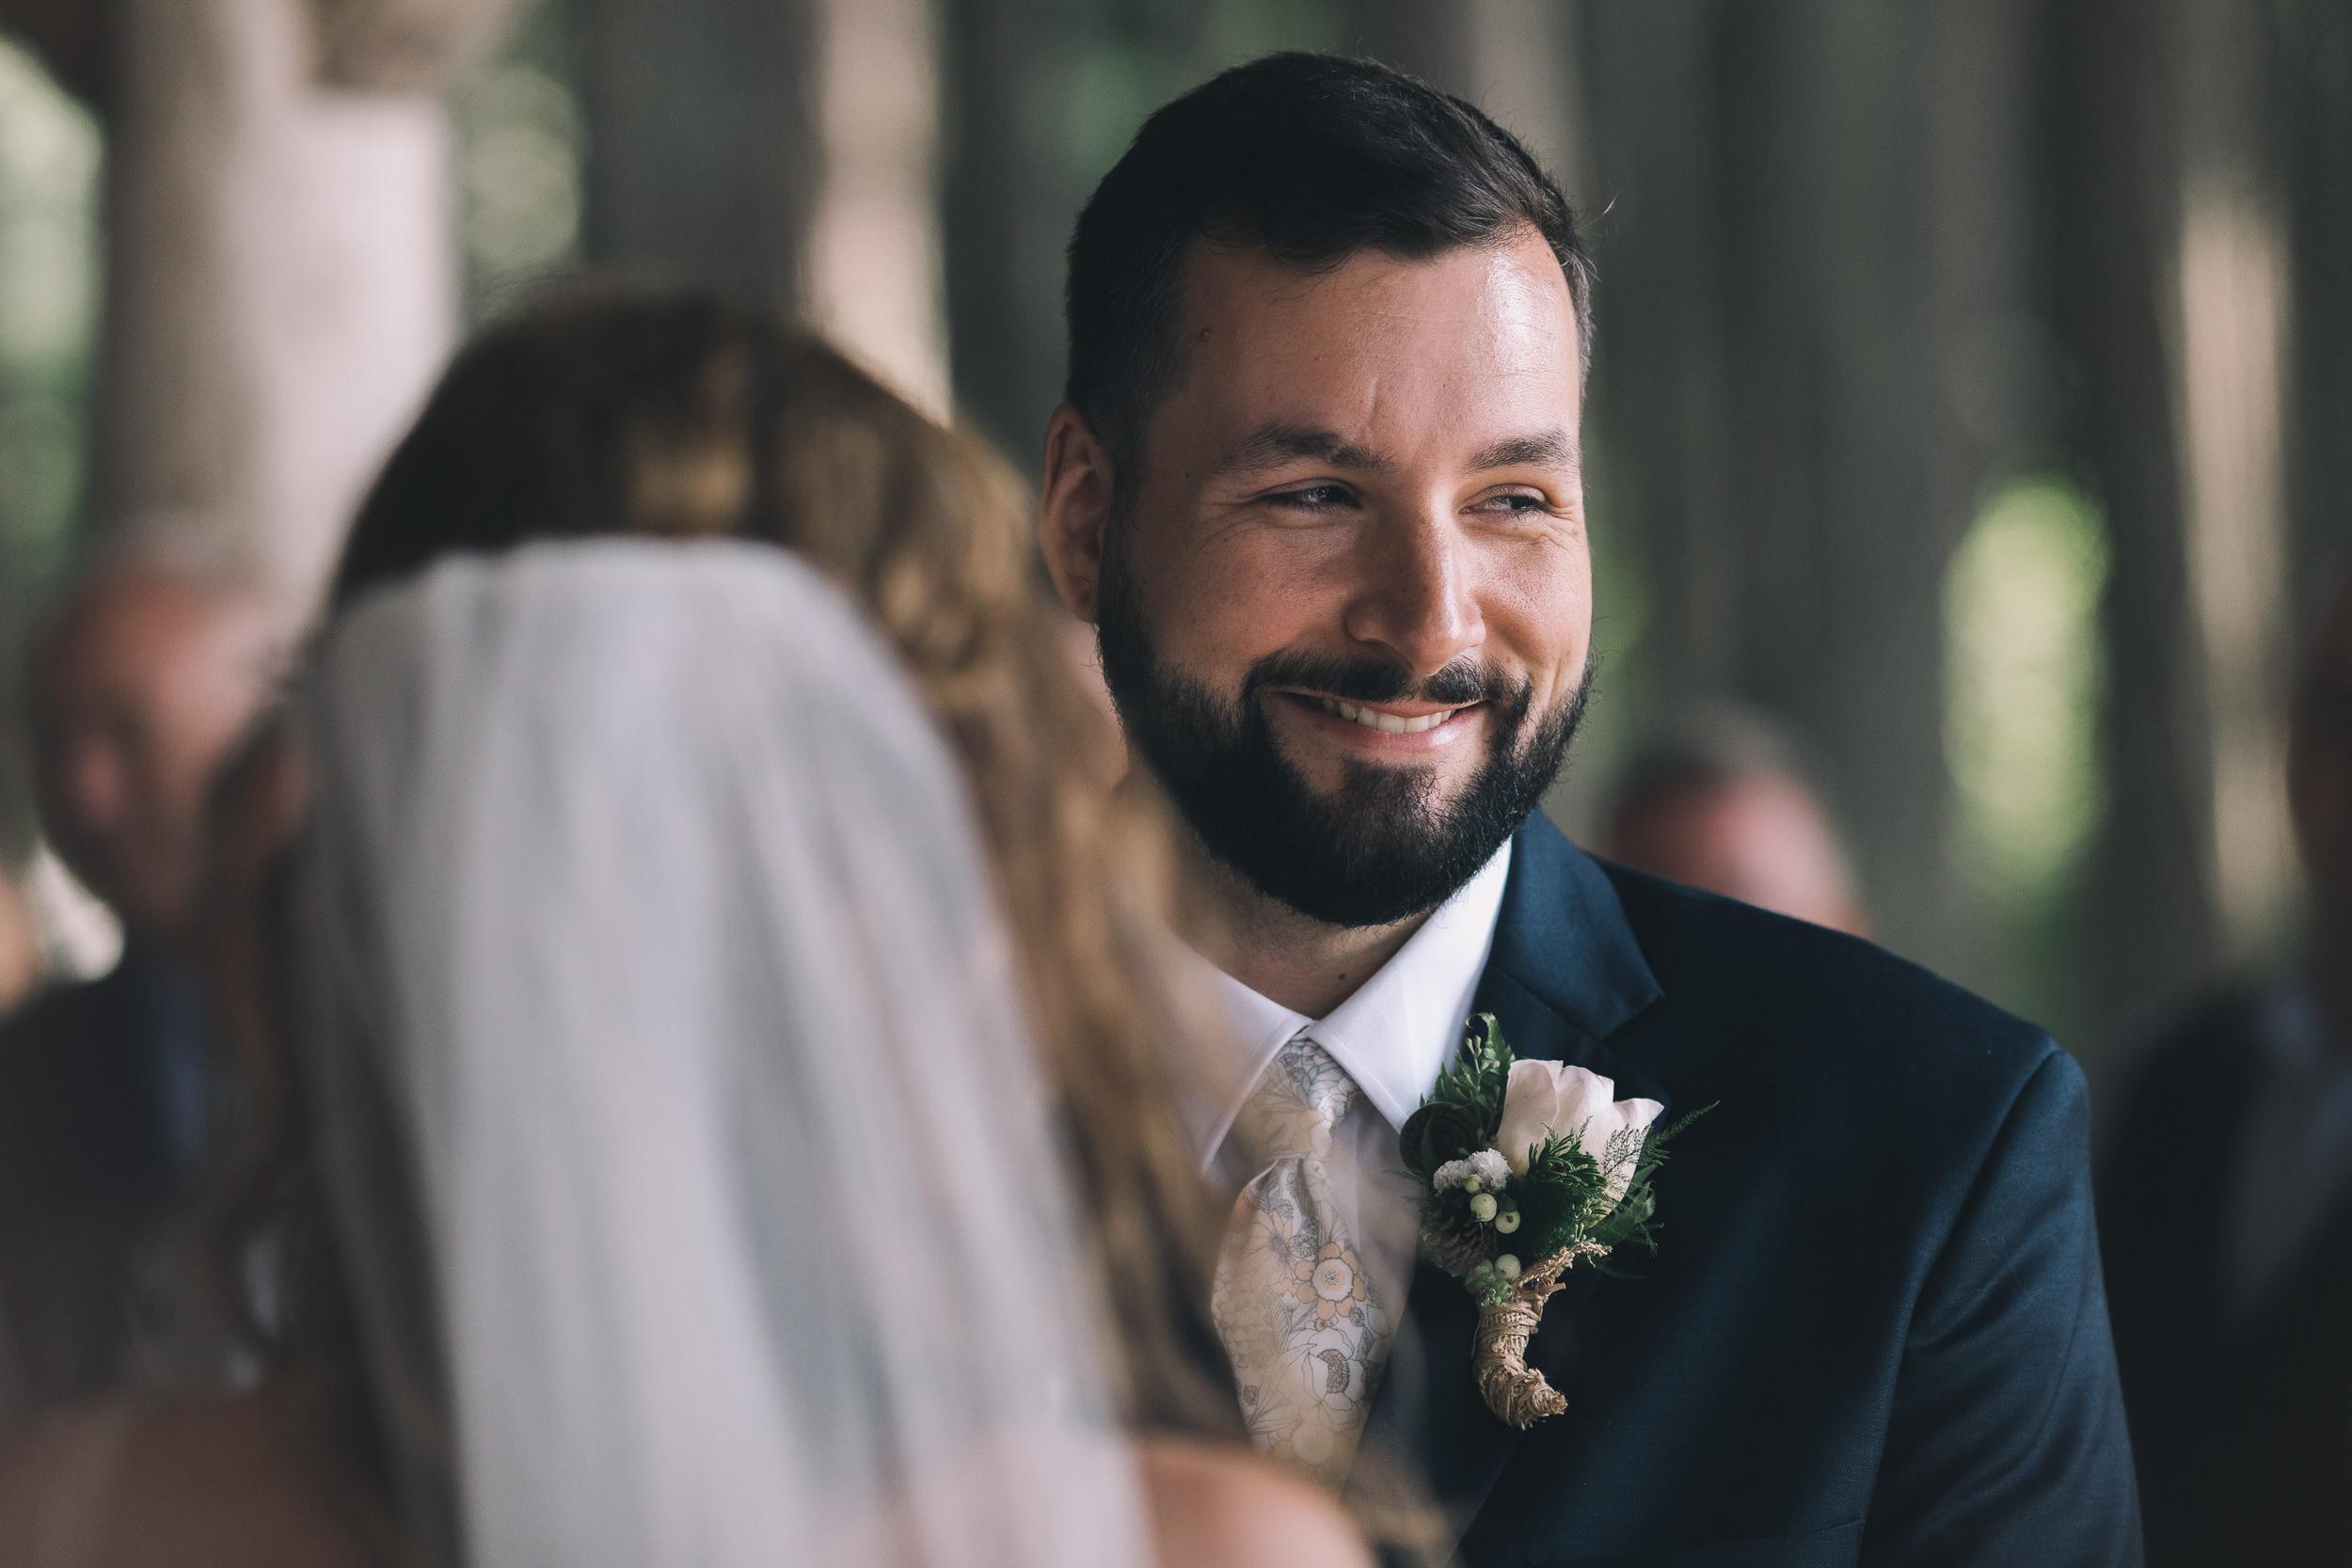 kitsap memorial state park groom smiling